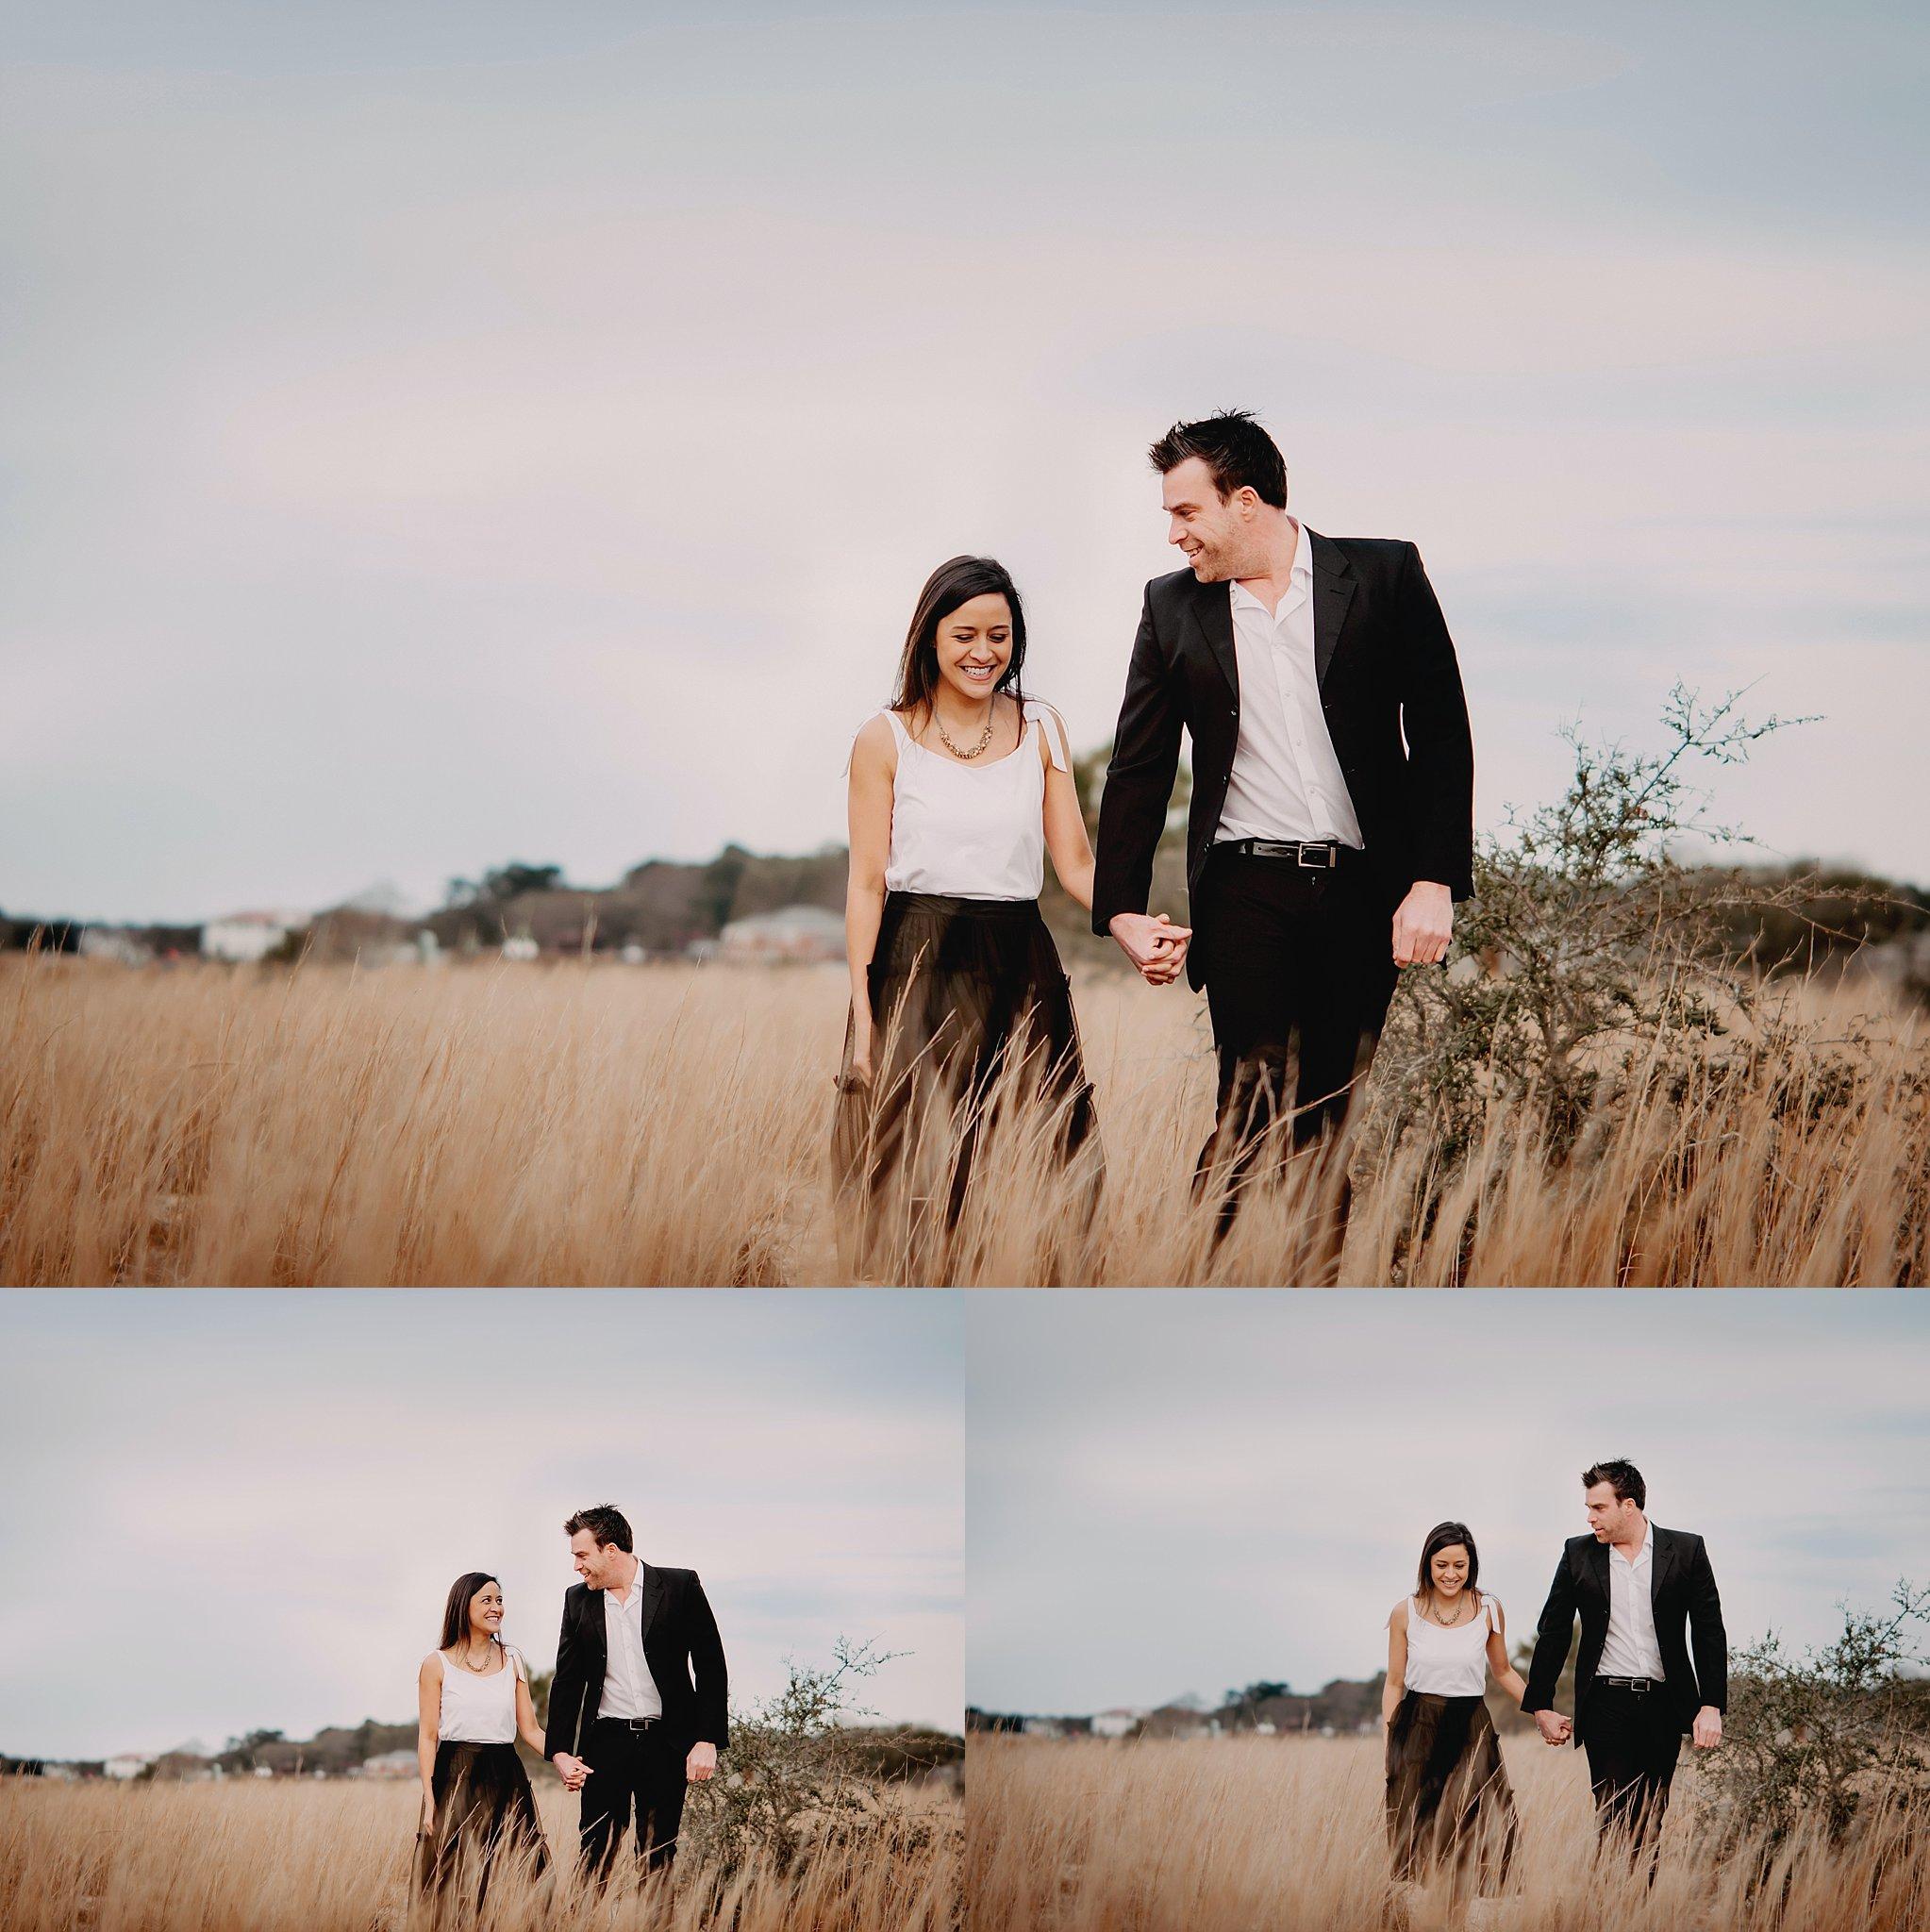 sunset-virginia-beach-engagemnet-portraits-melissa-bliss-photography-award-winning-VA-wedding-photographer.jpg